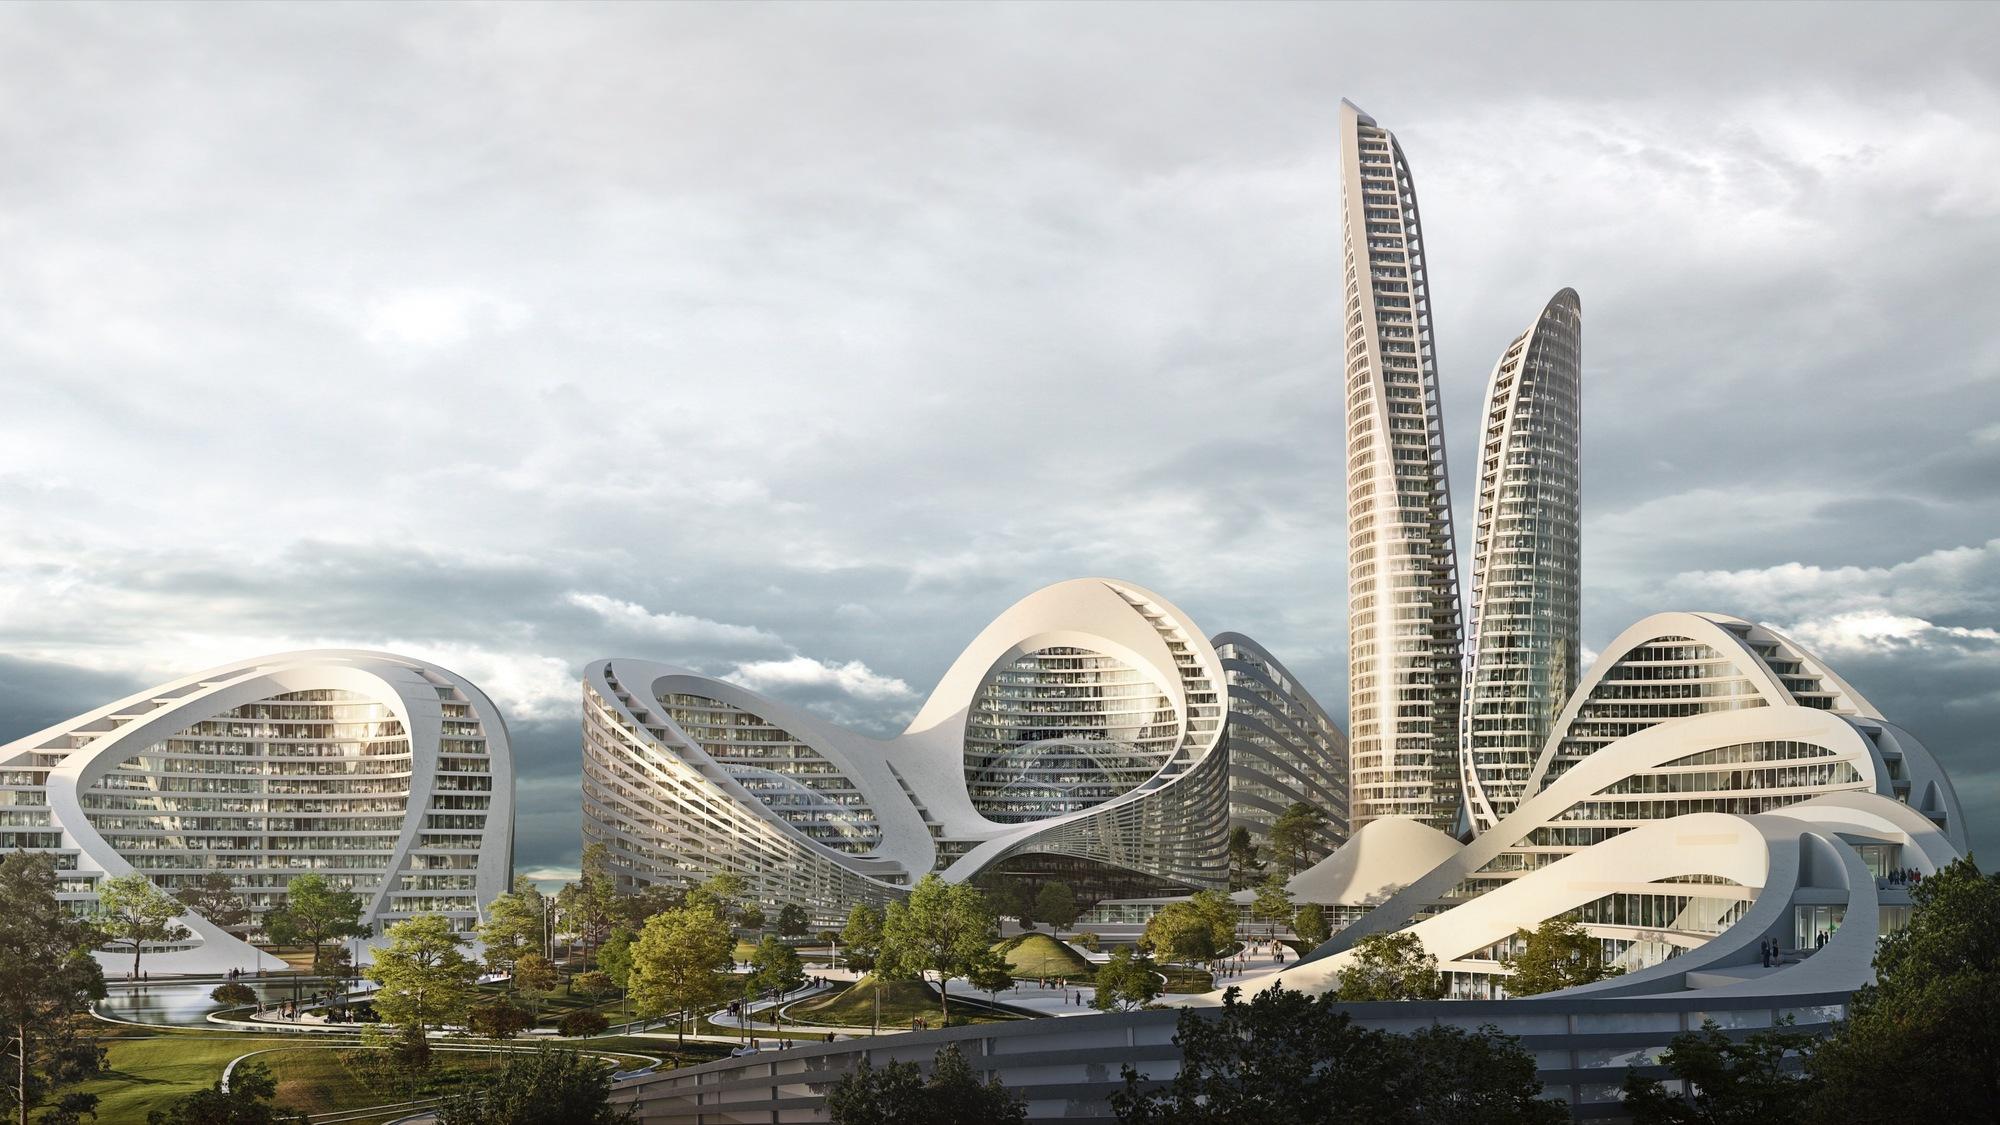 Zaha Hadid Architects Among Firms Chosen for Russian Mega-Smart City